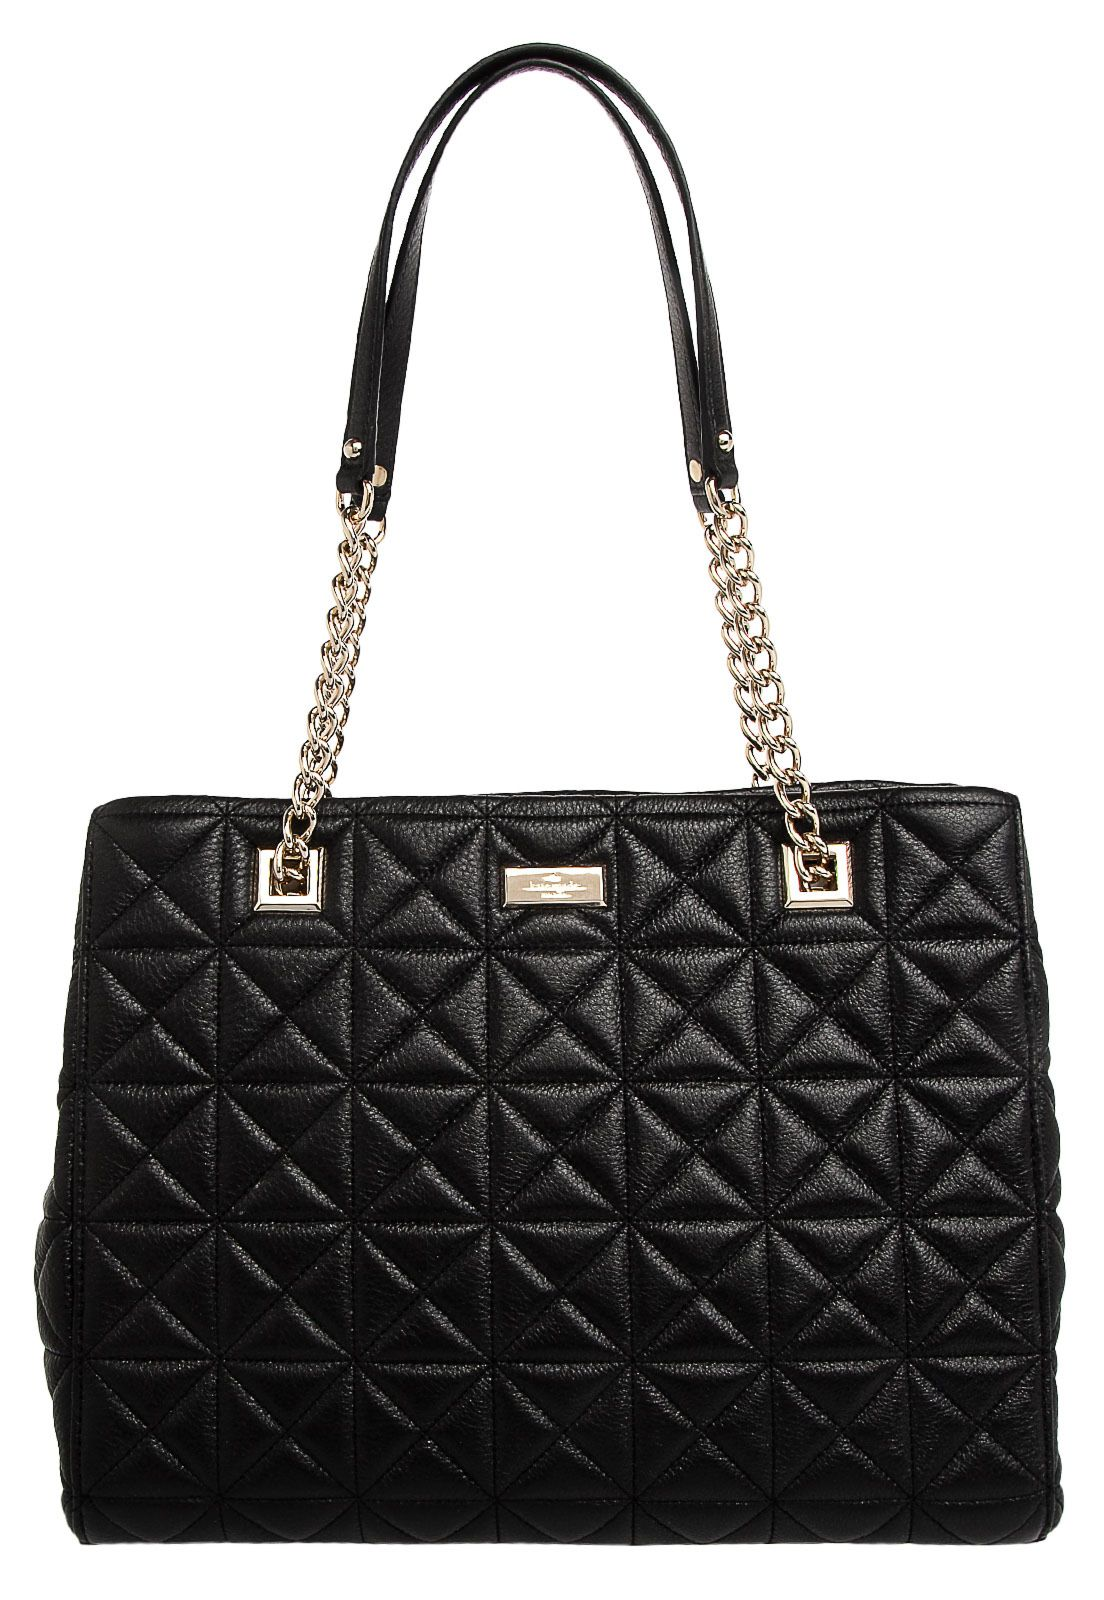 0b7729f06 Bolsa Kate Spade Preta | bag | Bags, Fashion e Shoulder Bag